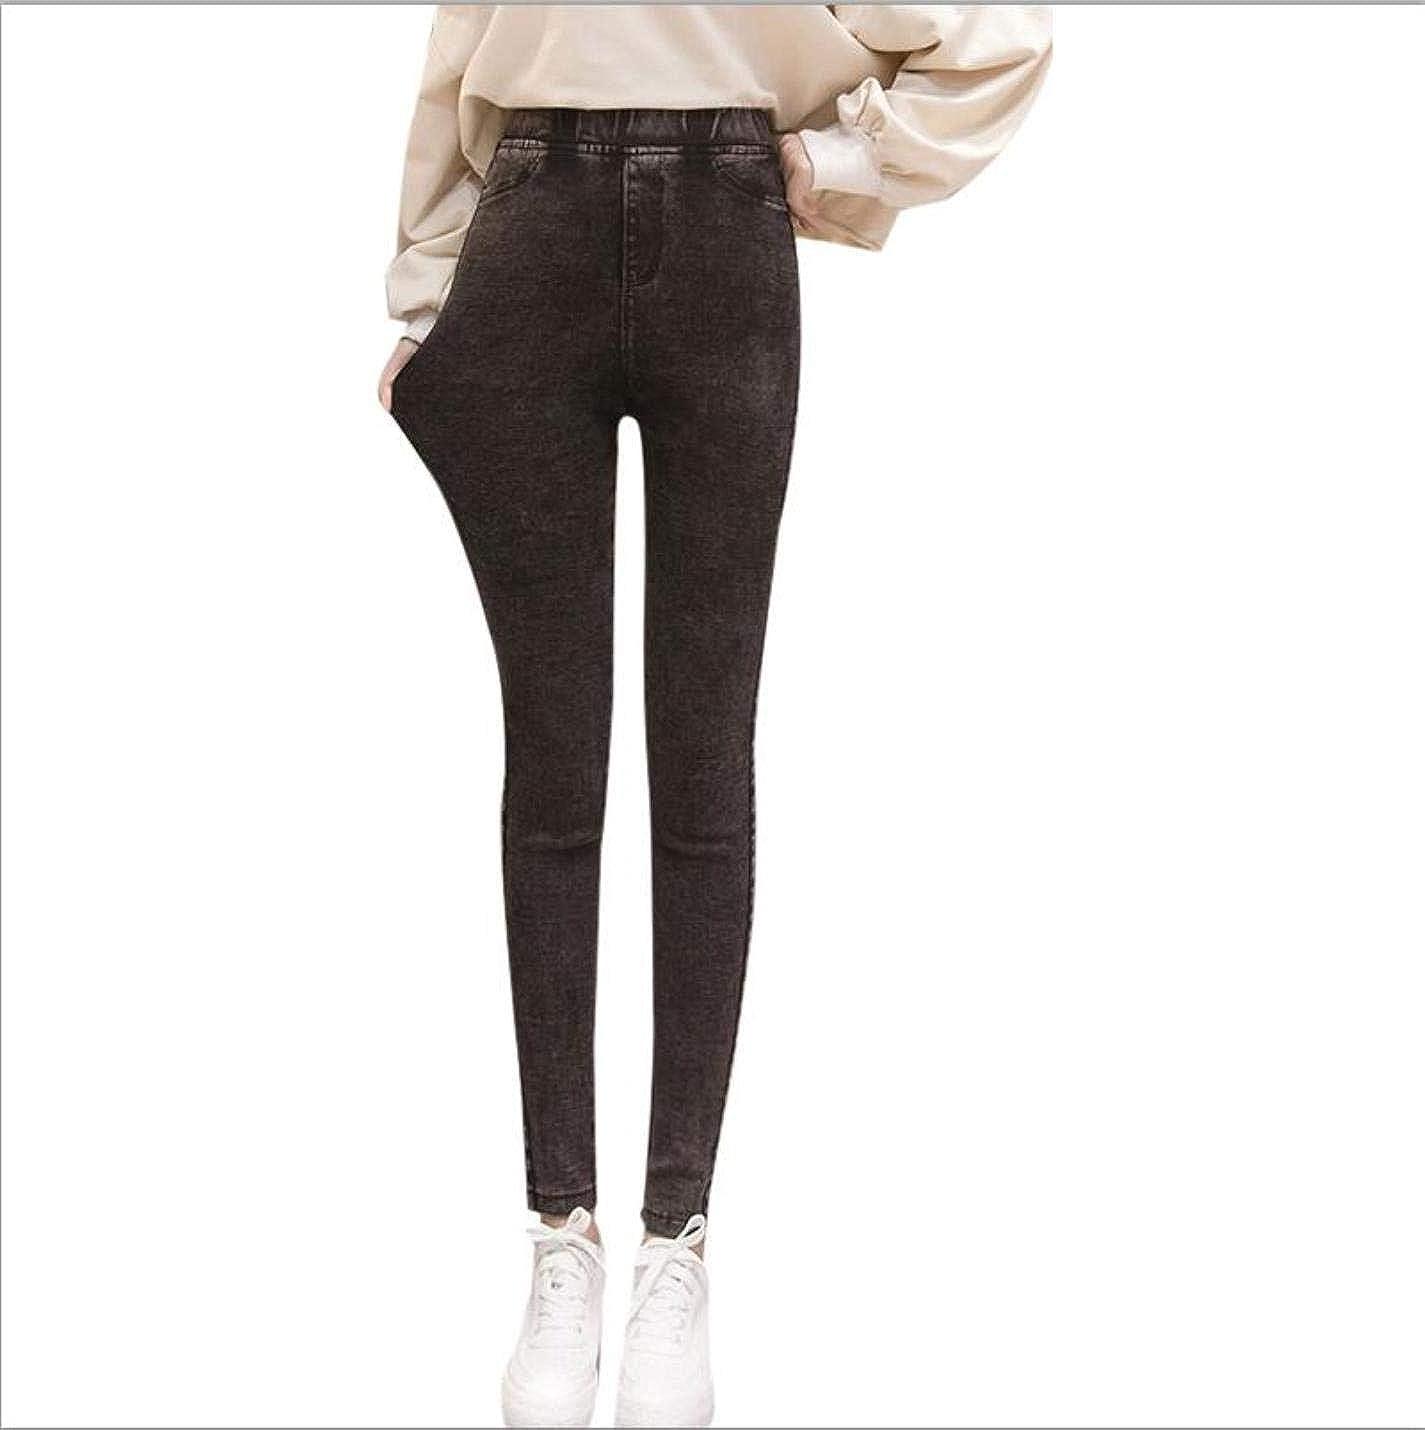 BxjkaEWA Womens Tight-Fitting high-Elastic Waist Basic Jeans Slim Pencil Pants